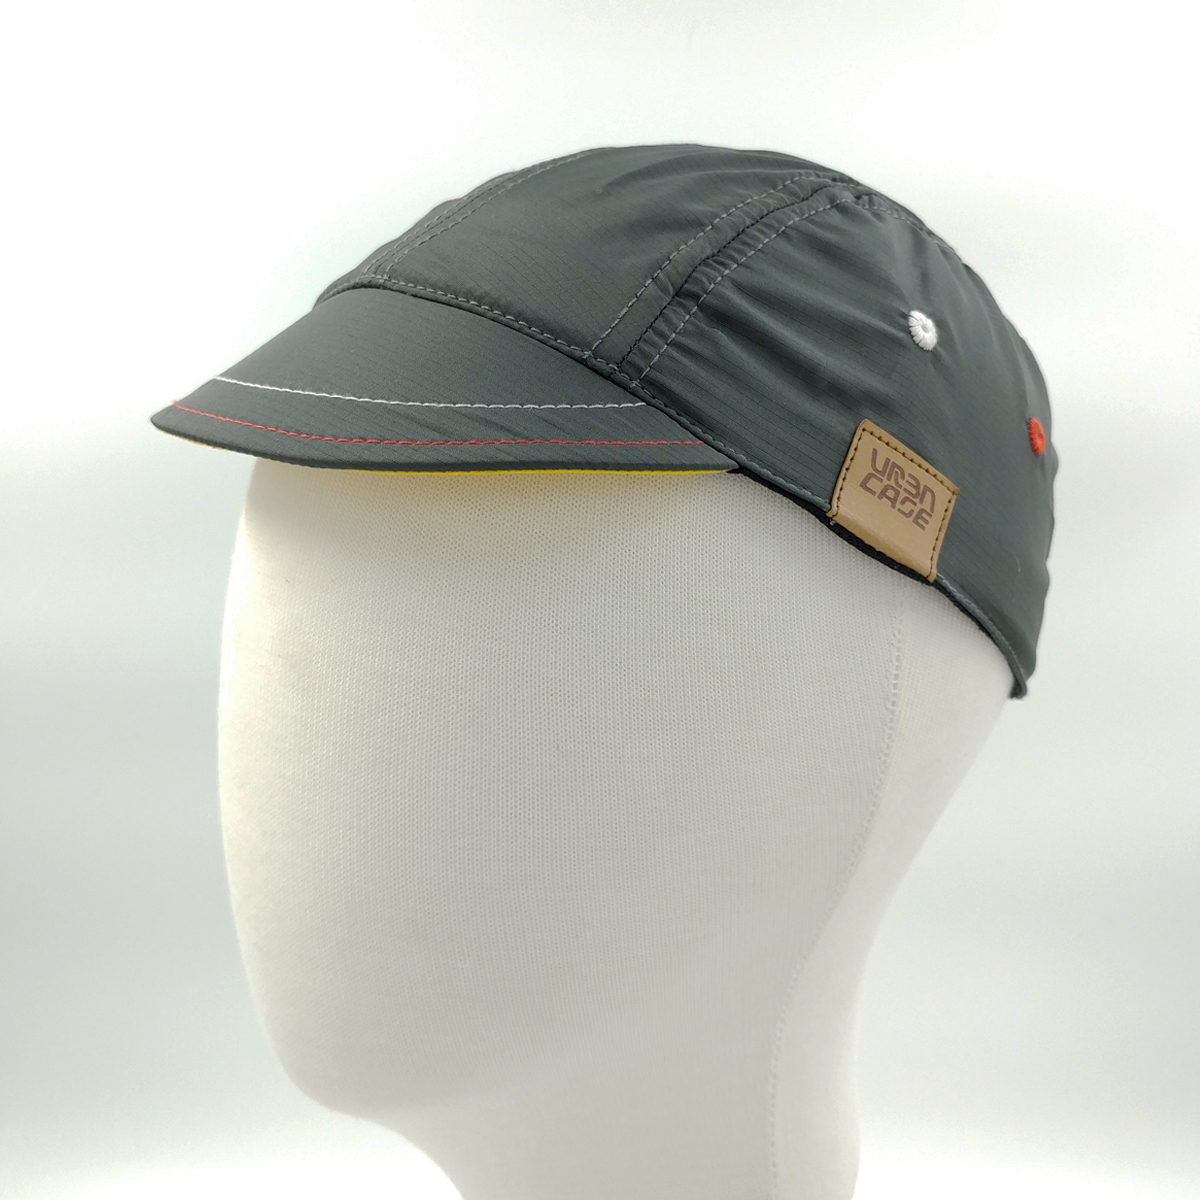 cycling cap - greygraven1